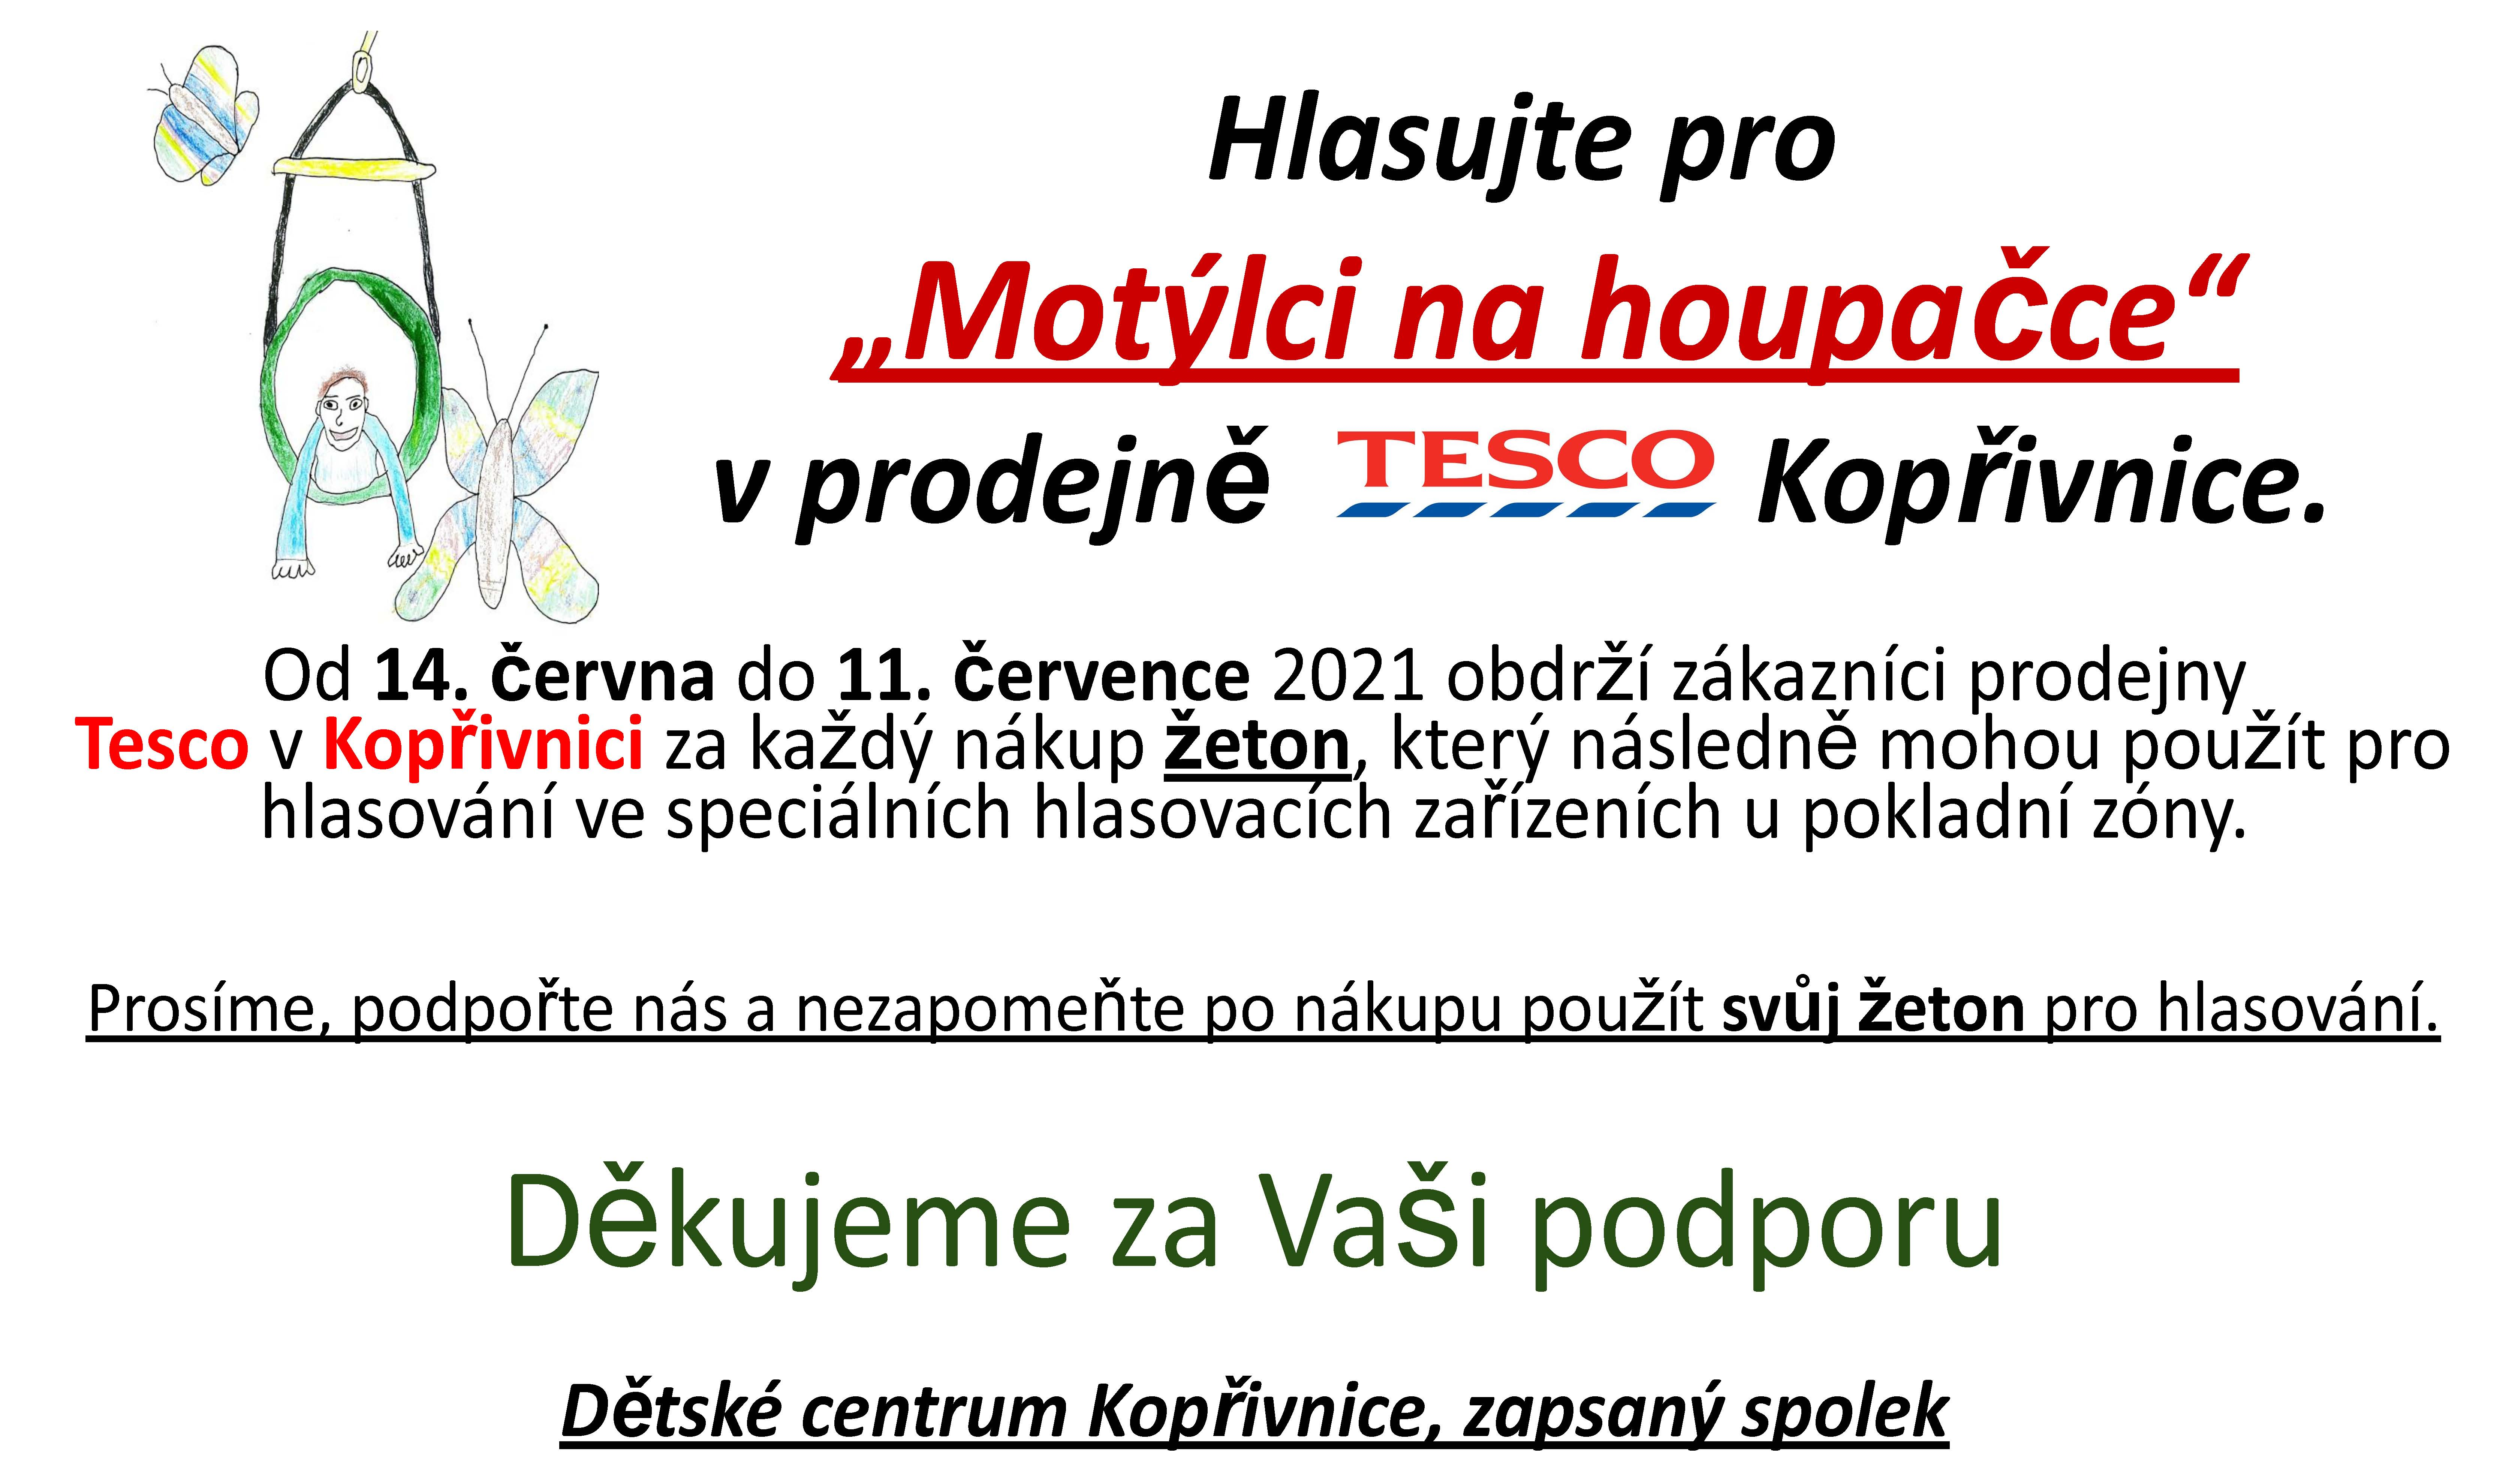 motylci_na_houpacce_2021